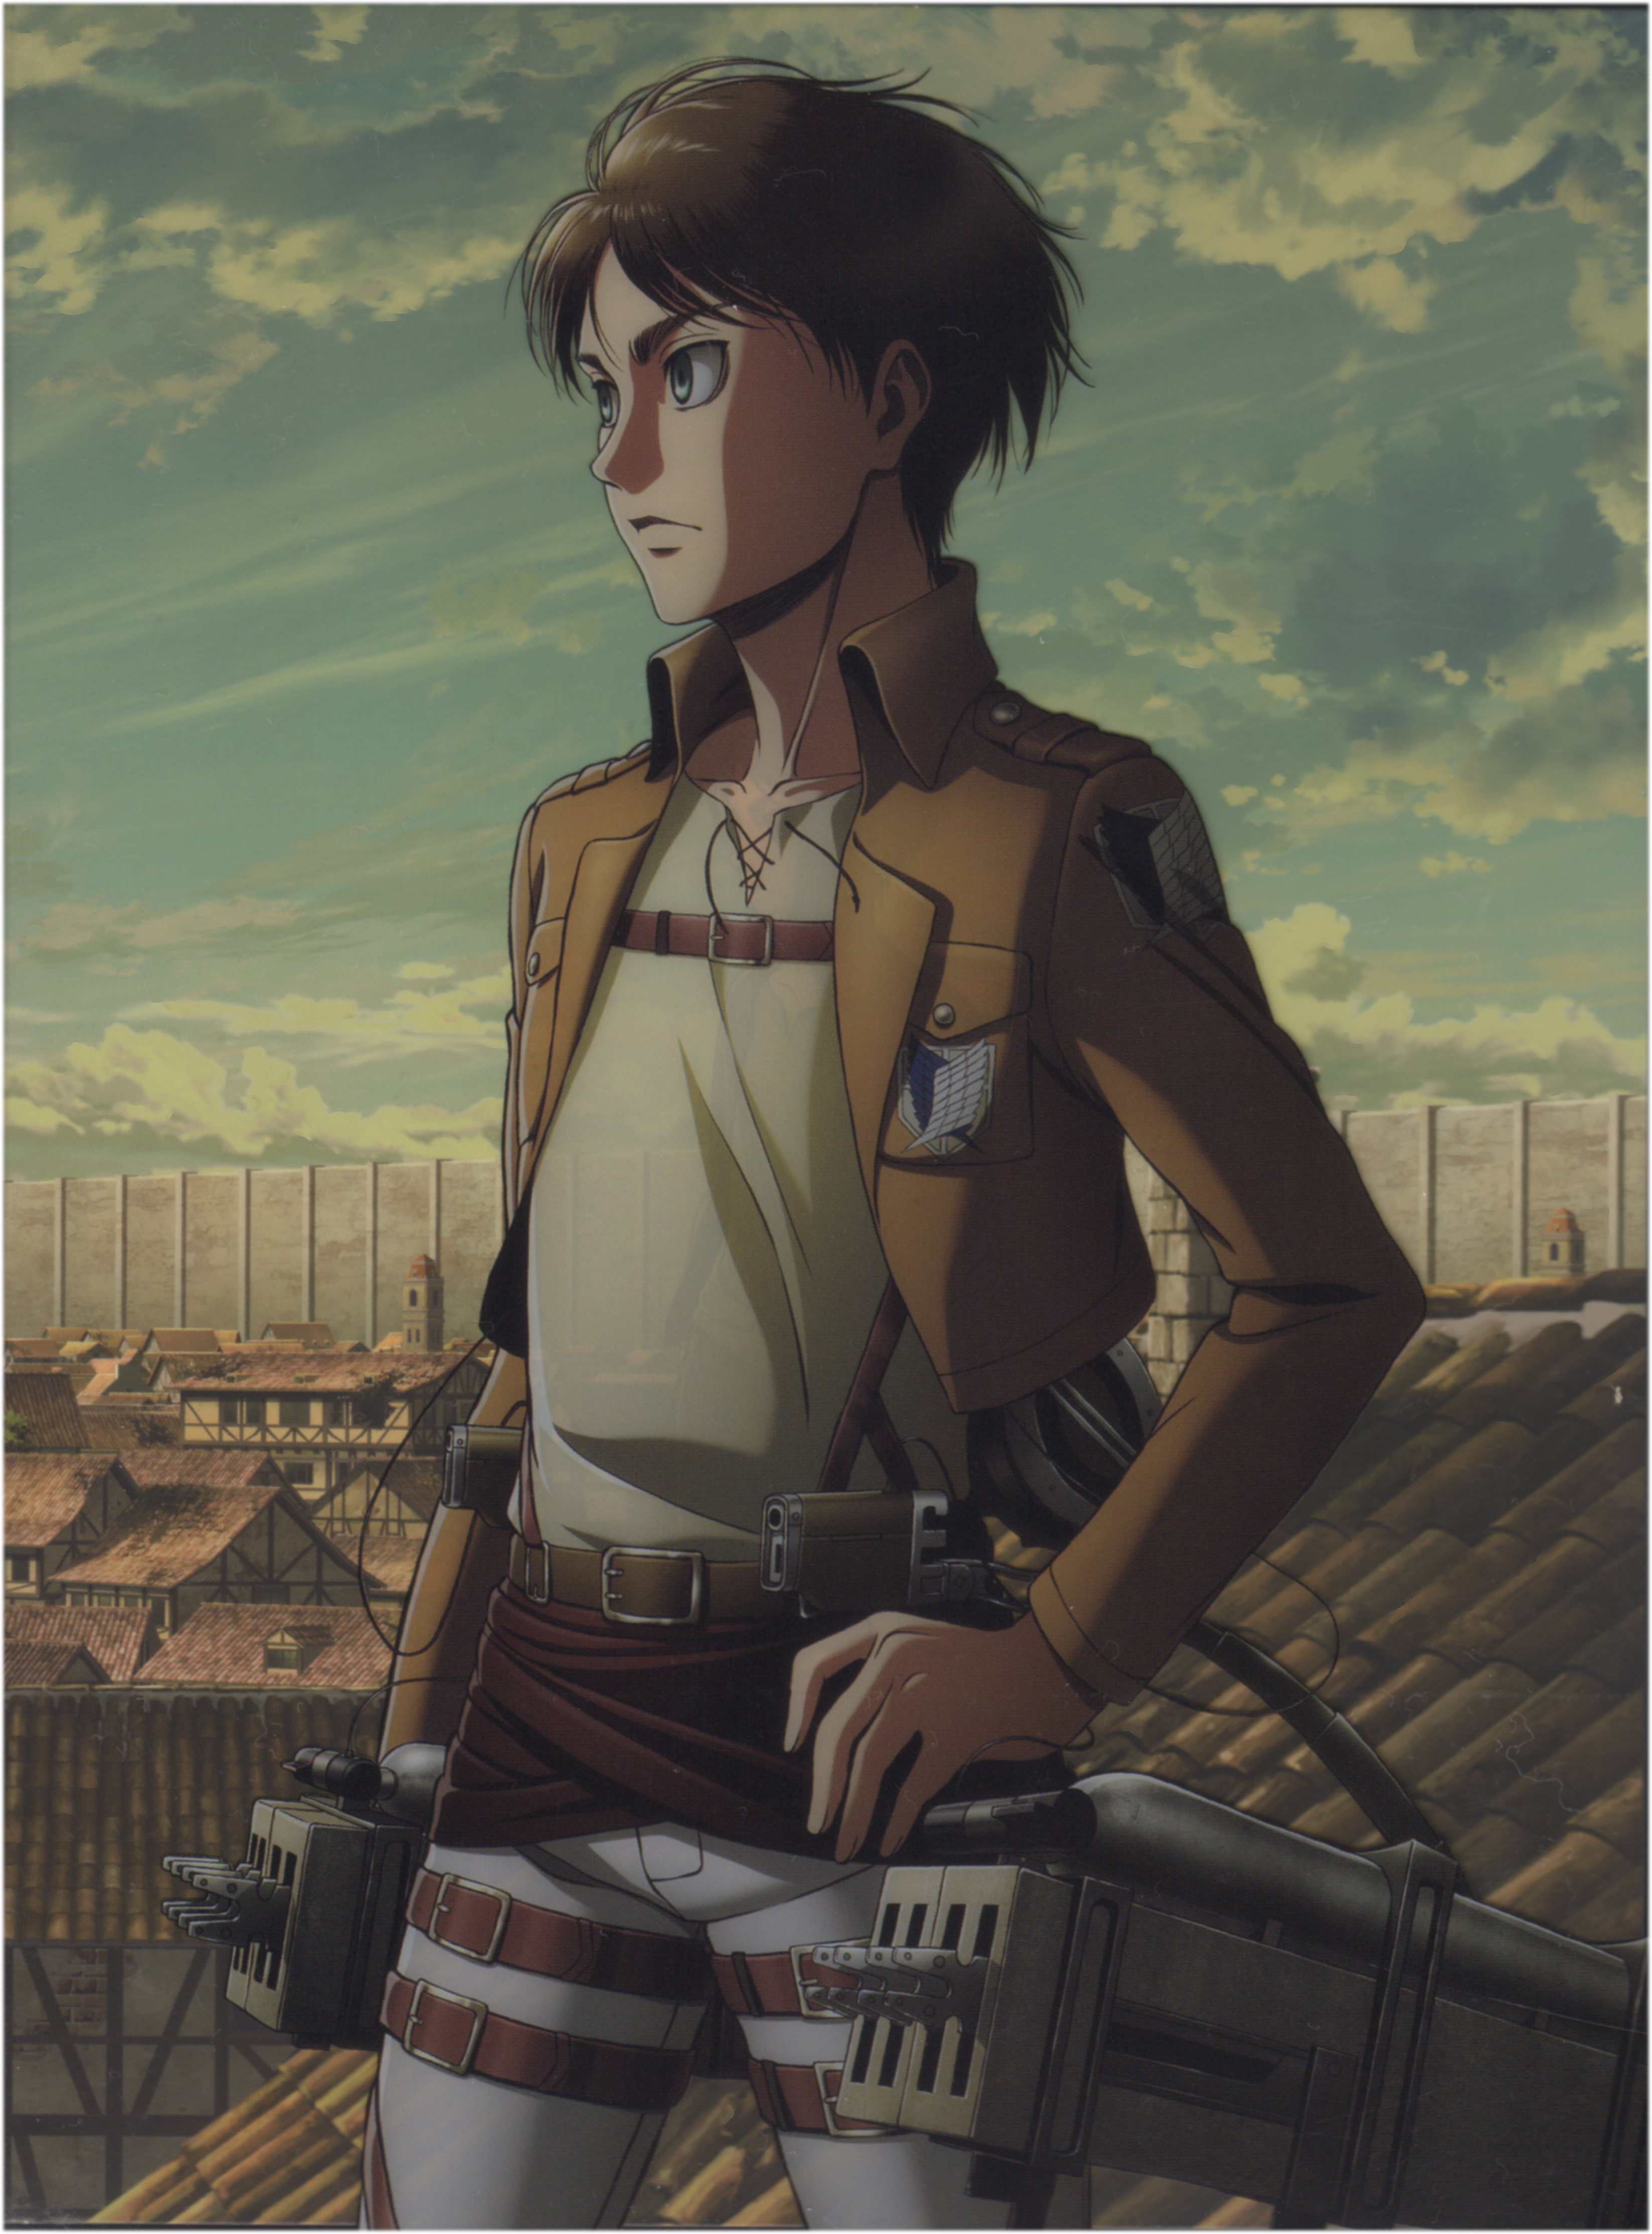 Eren Jaeger (Eren Yeager) - Attack on Titan - Image #2730006 - Zerochan  Anime Image Board